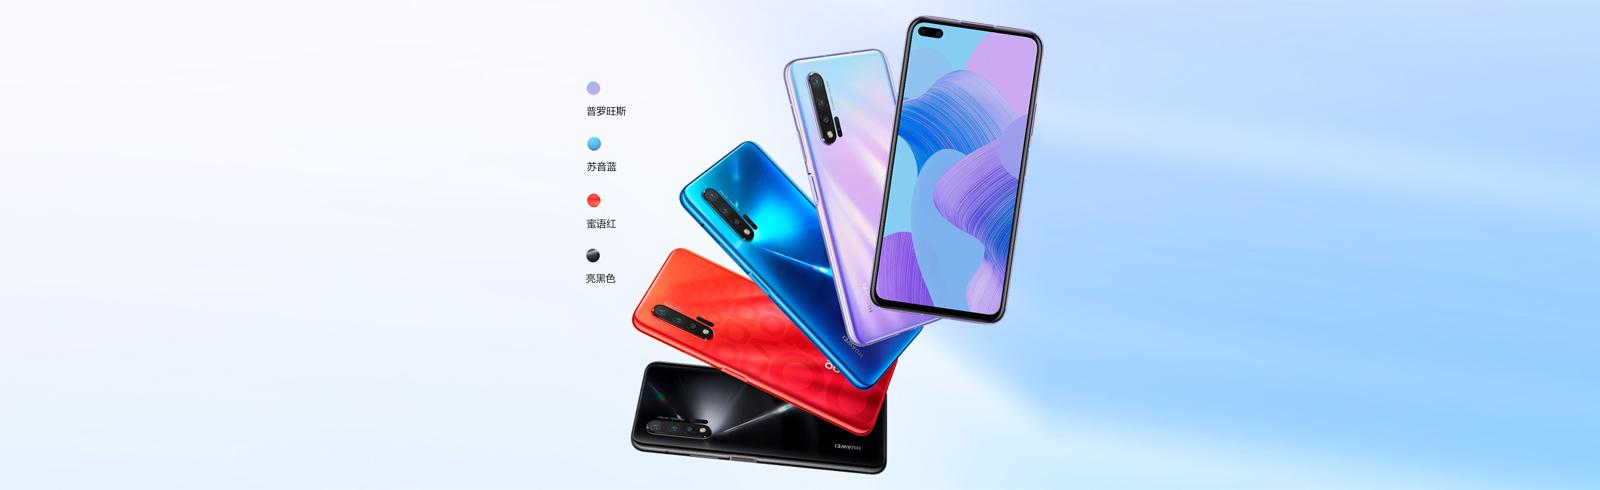 Huawei unveils the nova 6 5G, nova 6 and the nova 6 SE